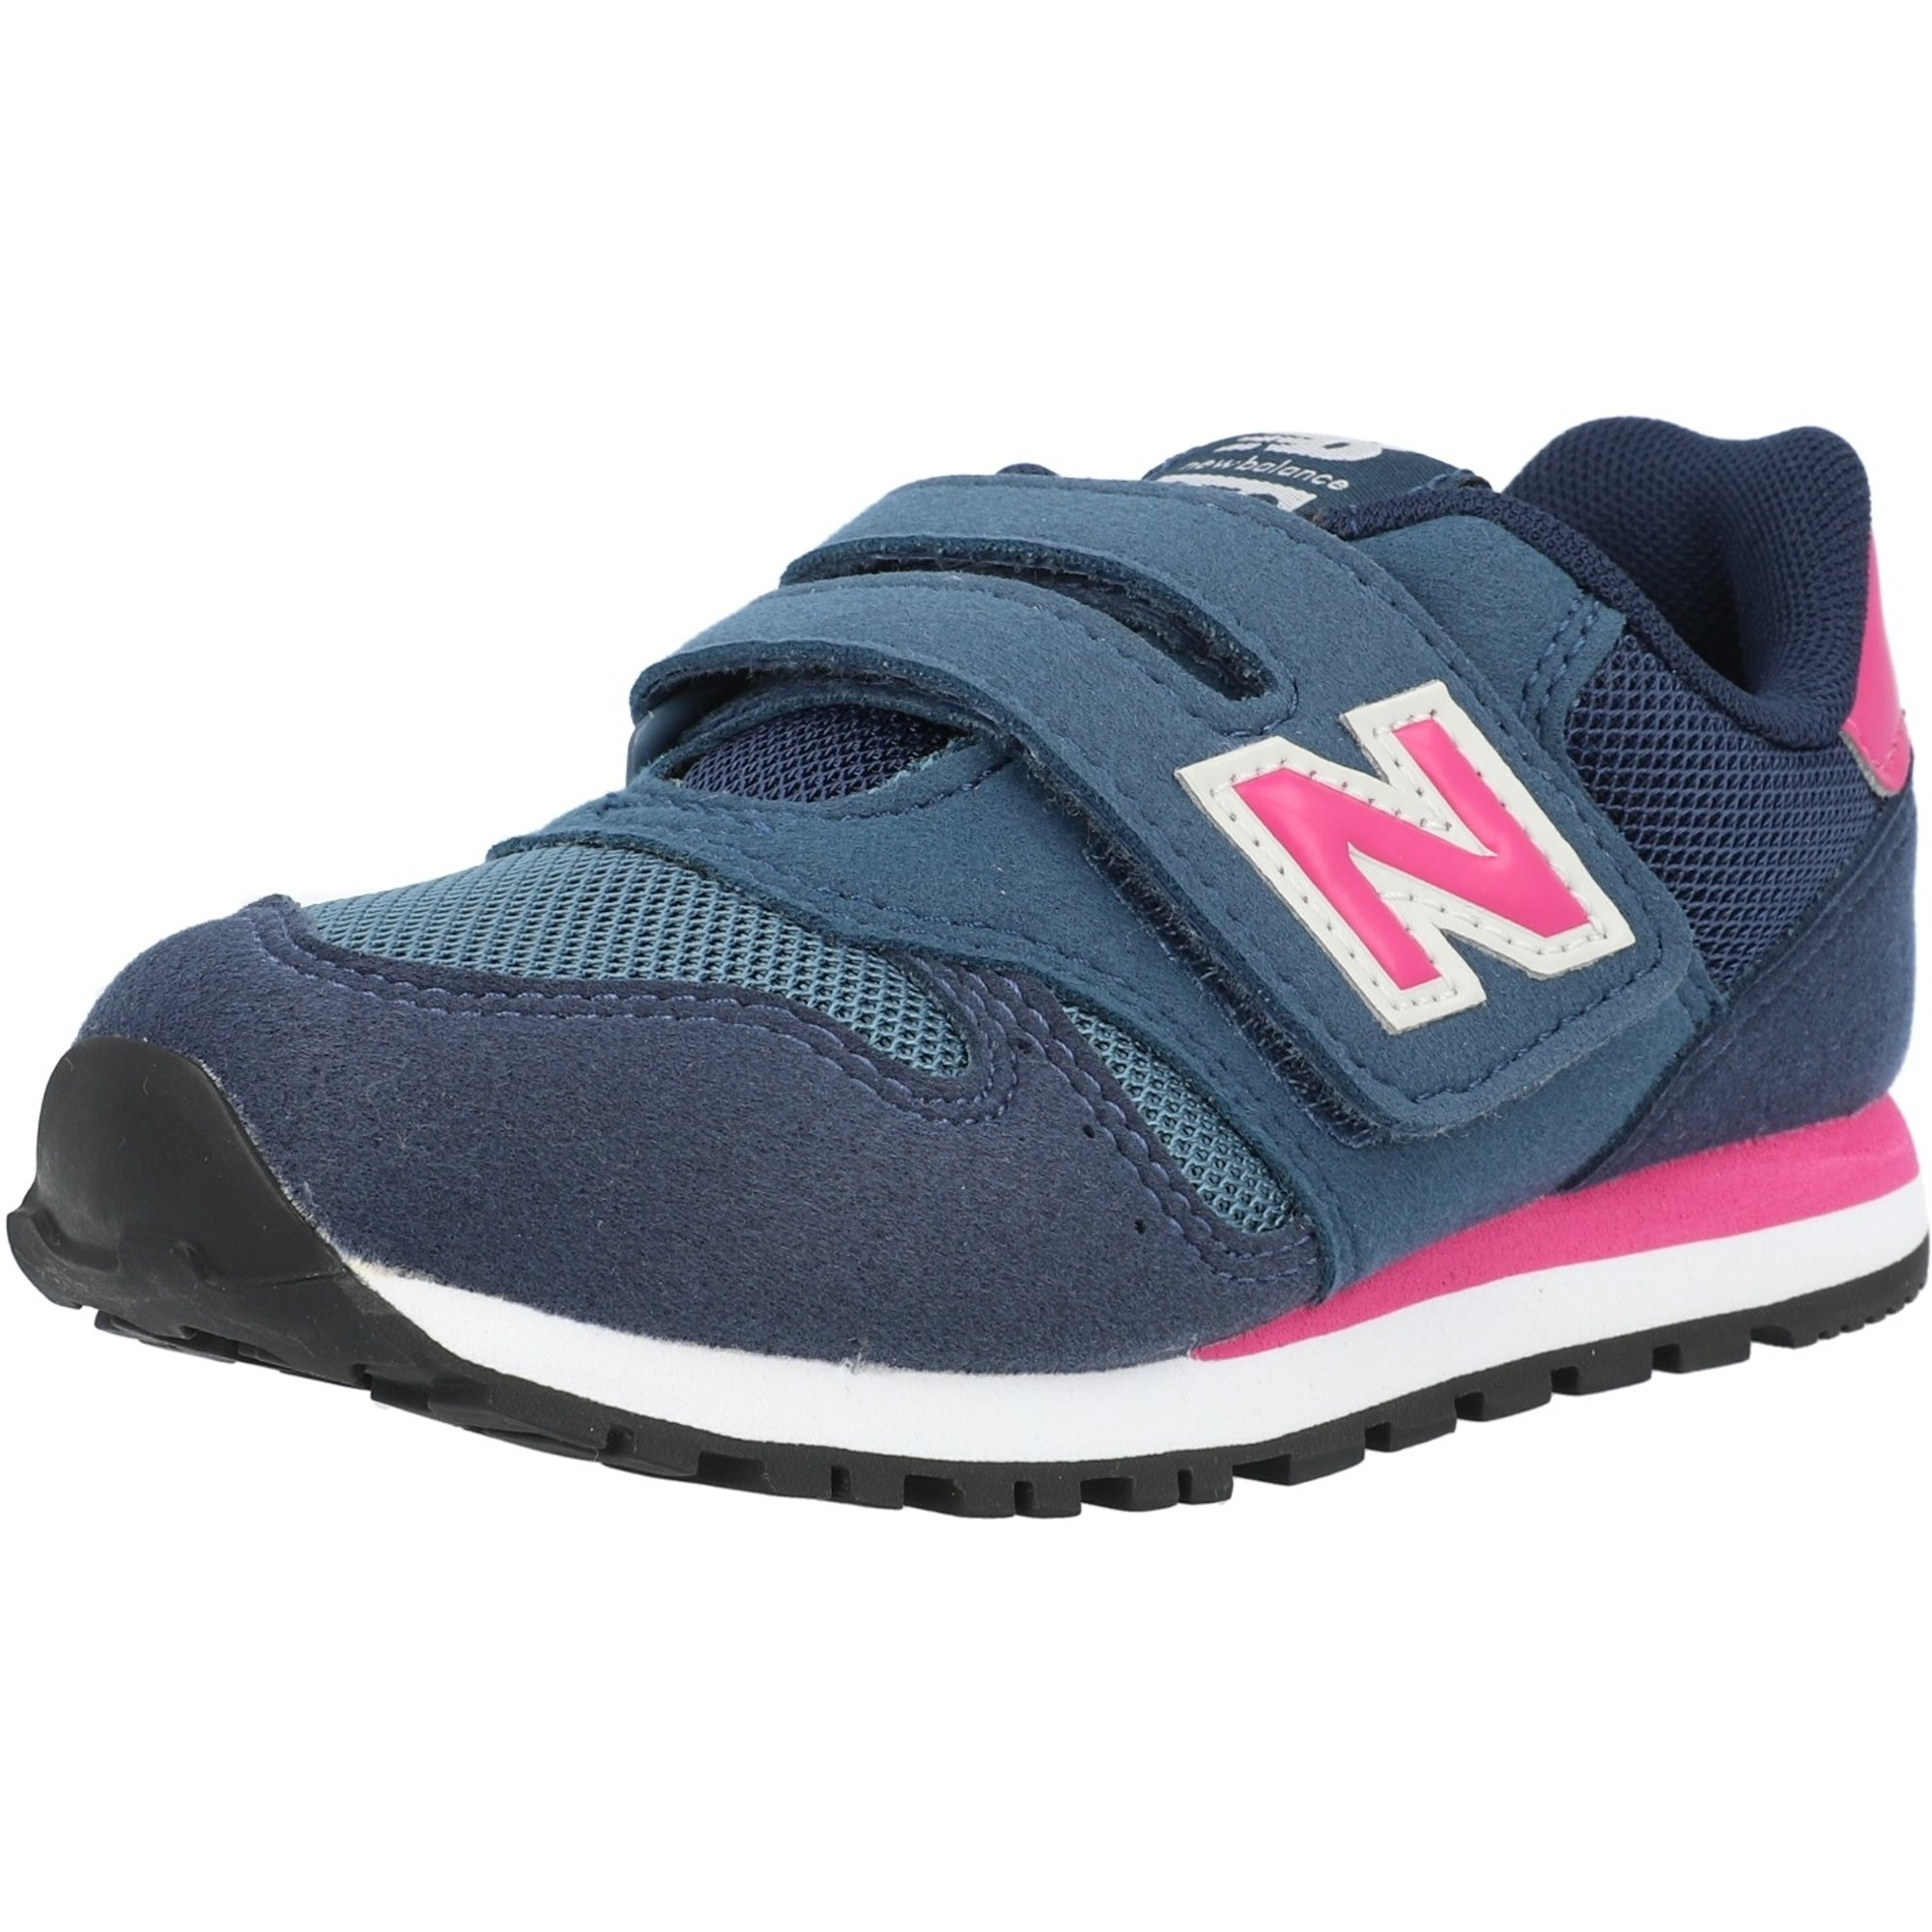 New Balance 373 Stone Blue/Exuberant Pink Suede Child